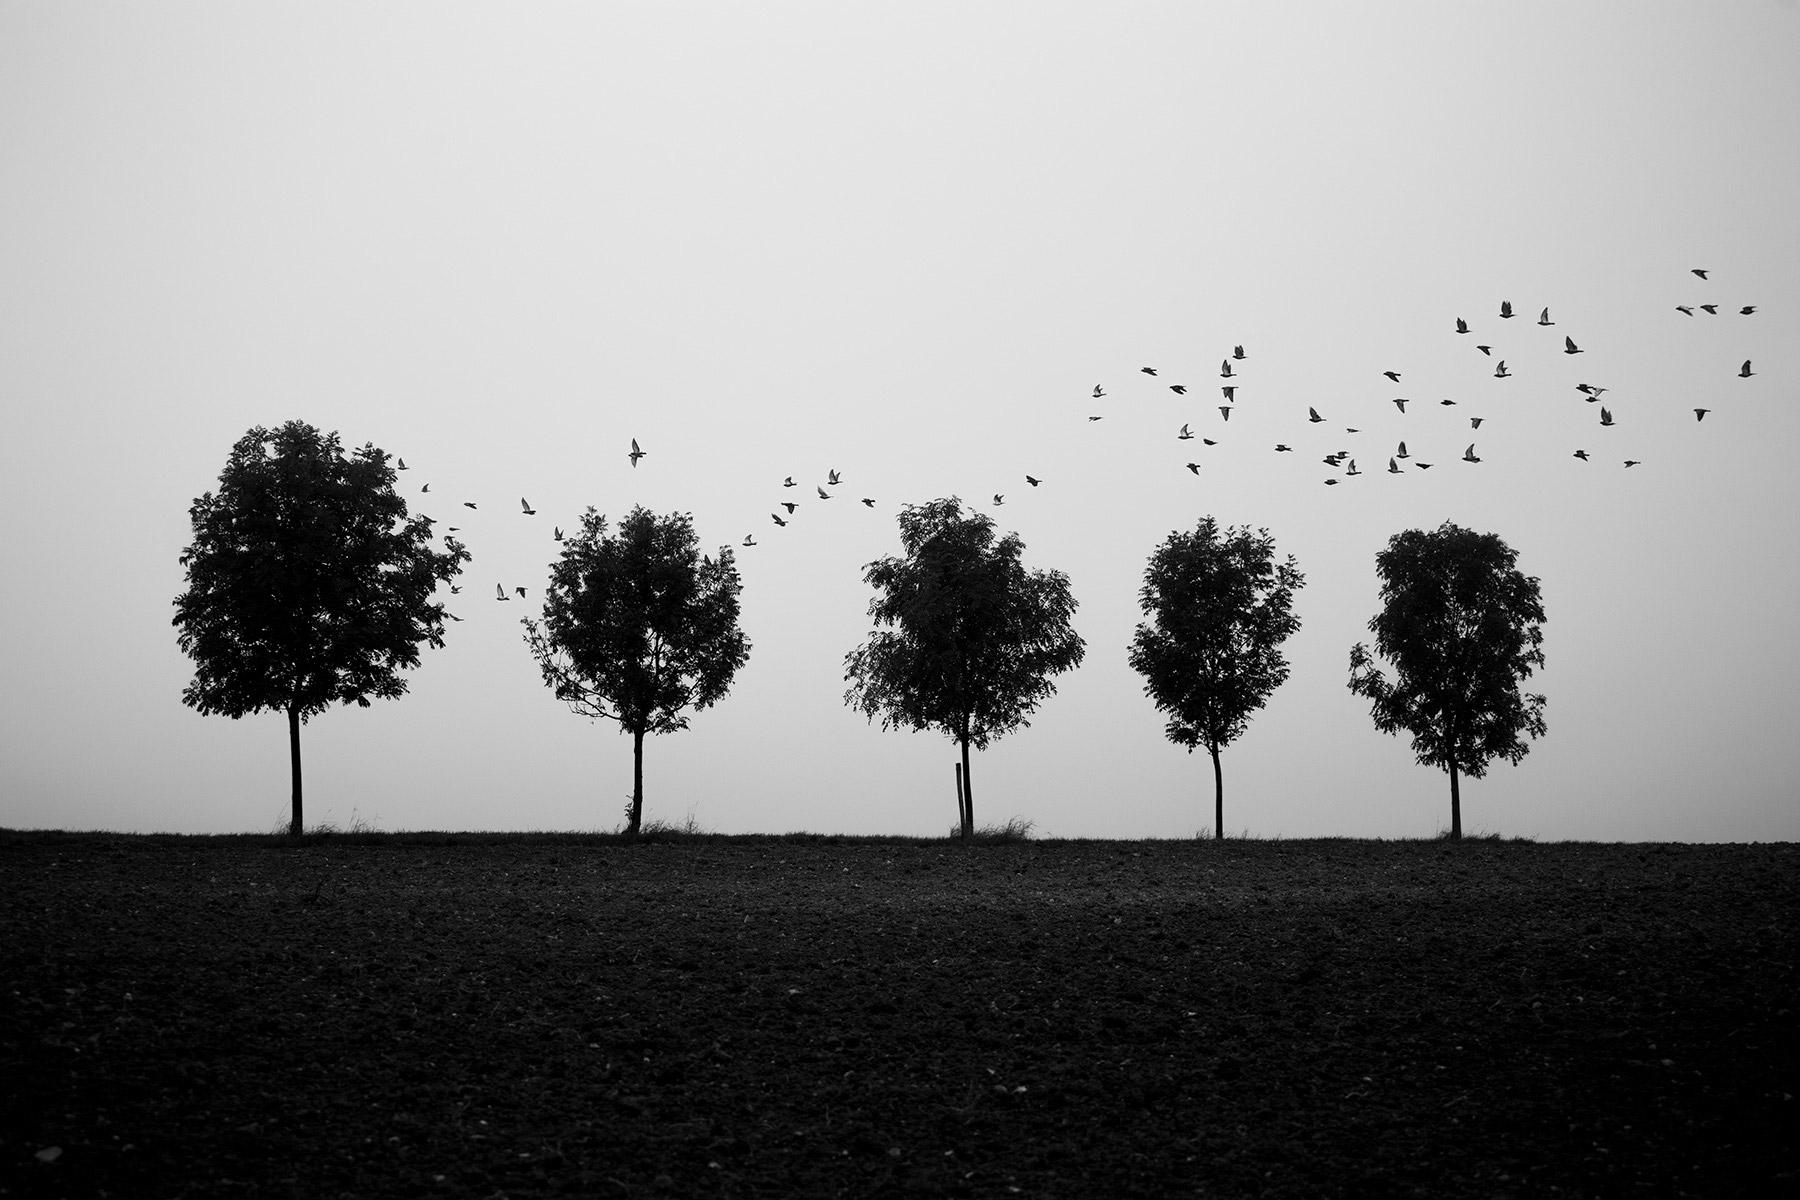 photographies noir et blanc wendering black and white photography arbre surrealism surrealiste chemin